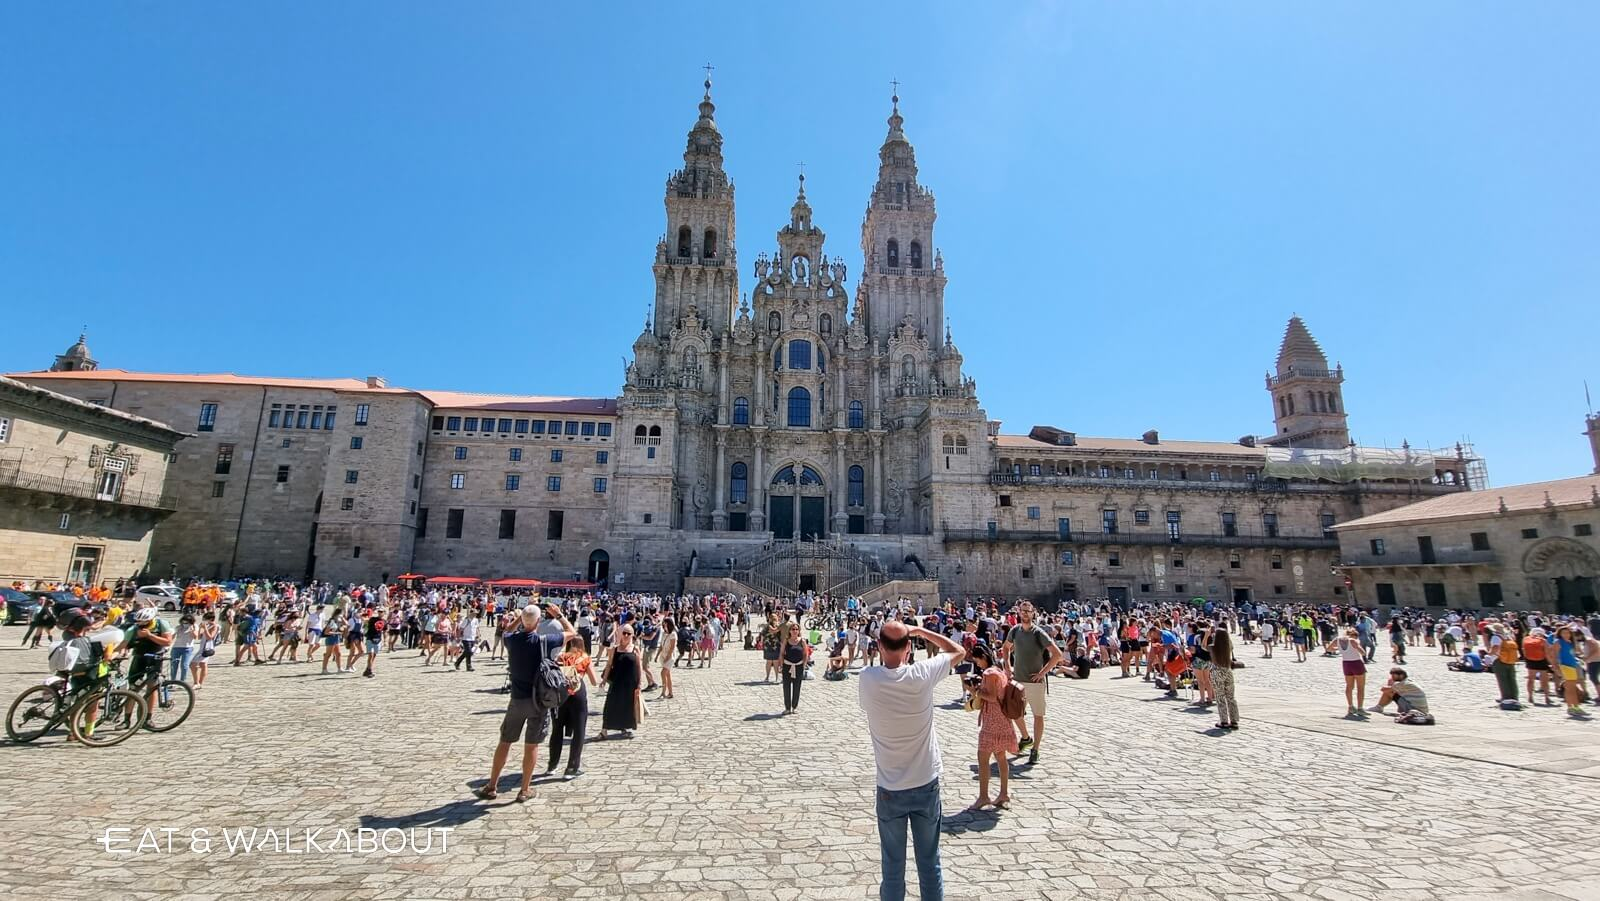 The Santiago Cake: The Oldest Traditional Recipe of Galicia - Santiago de Compostela Cathedral